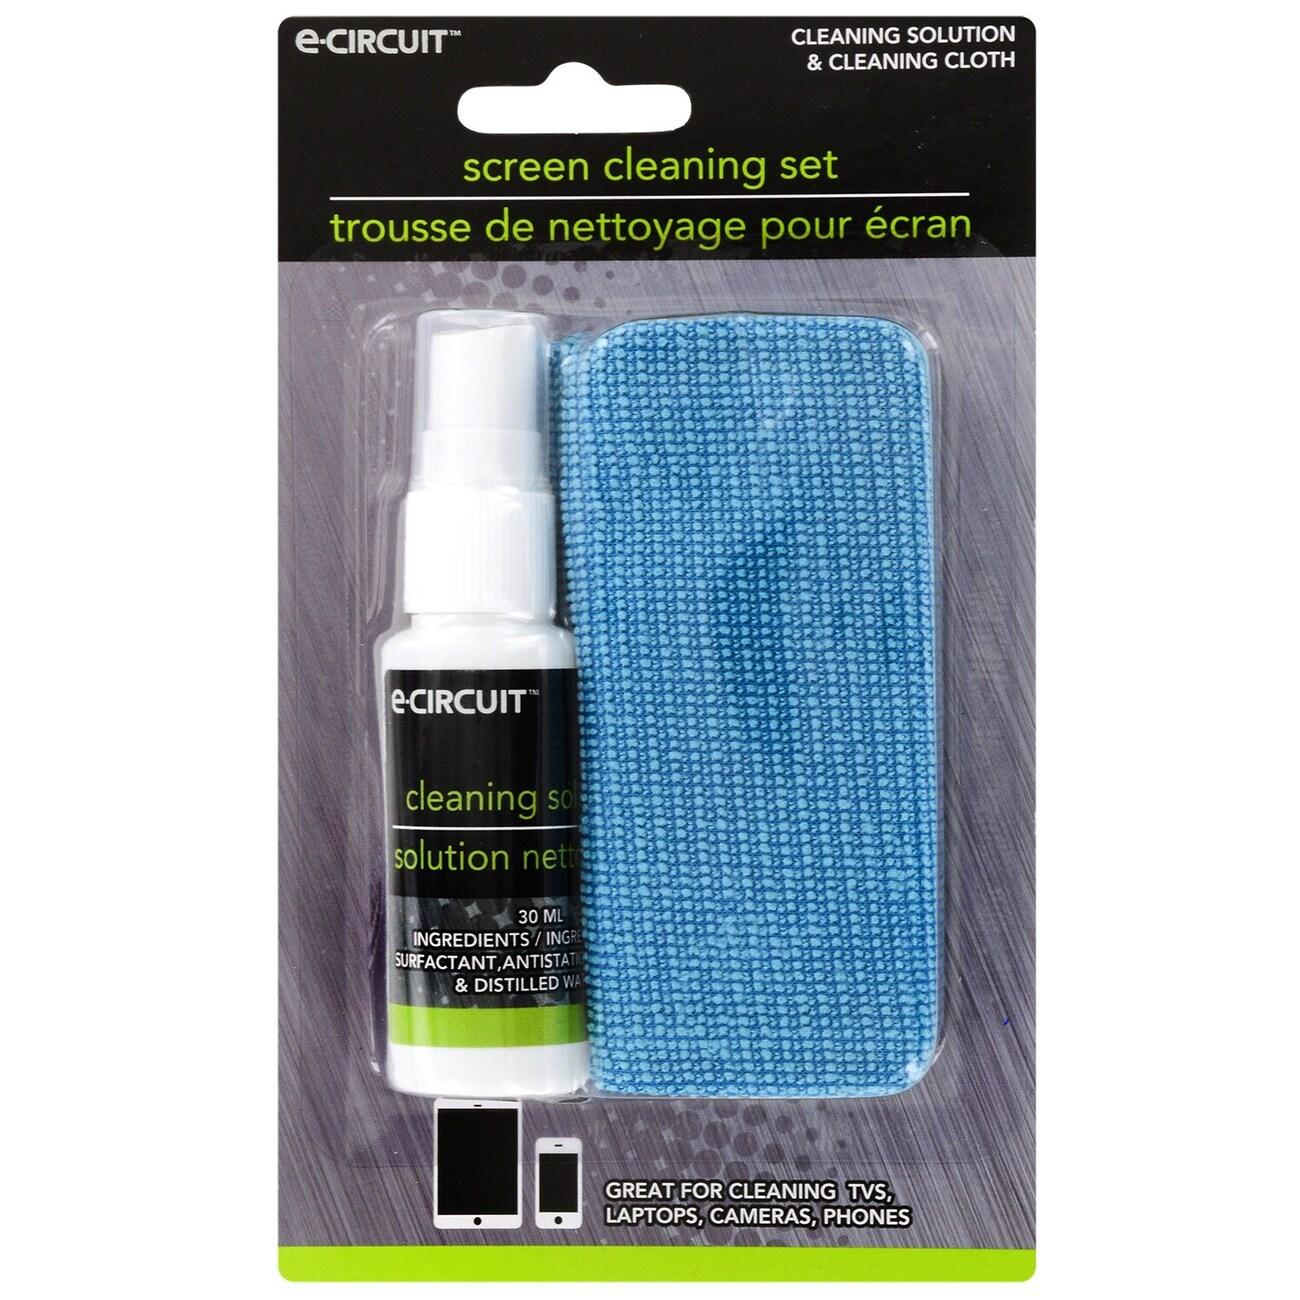 Cleaning Supplies Dollar Tree Inc Black Plastic Handle Pcb Circuit Board Anti Static Brushes 2 Pcs Ym E Lcd Sets Pc Kits